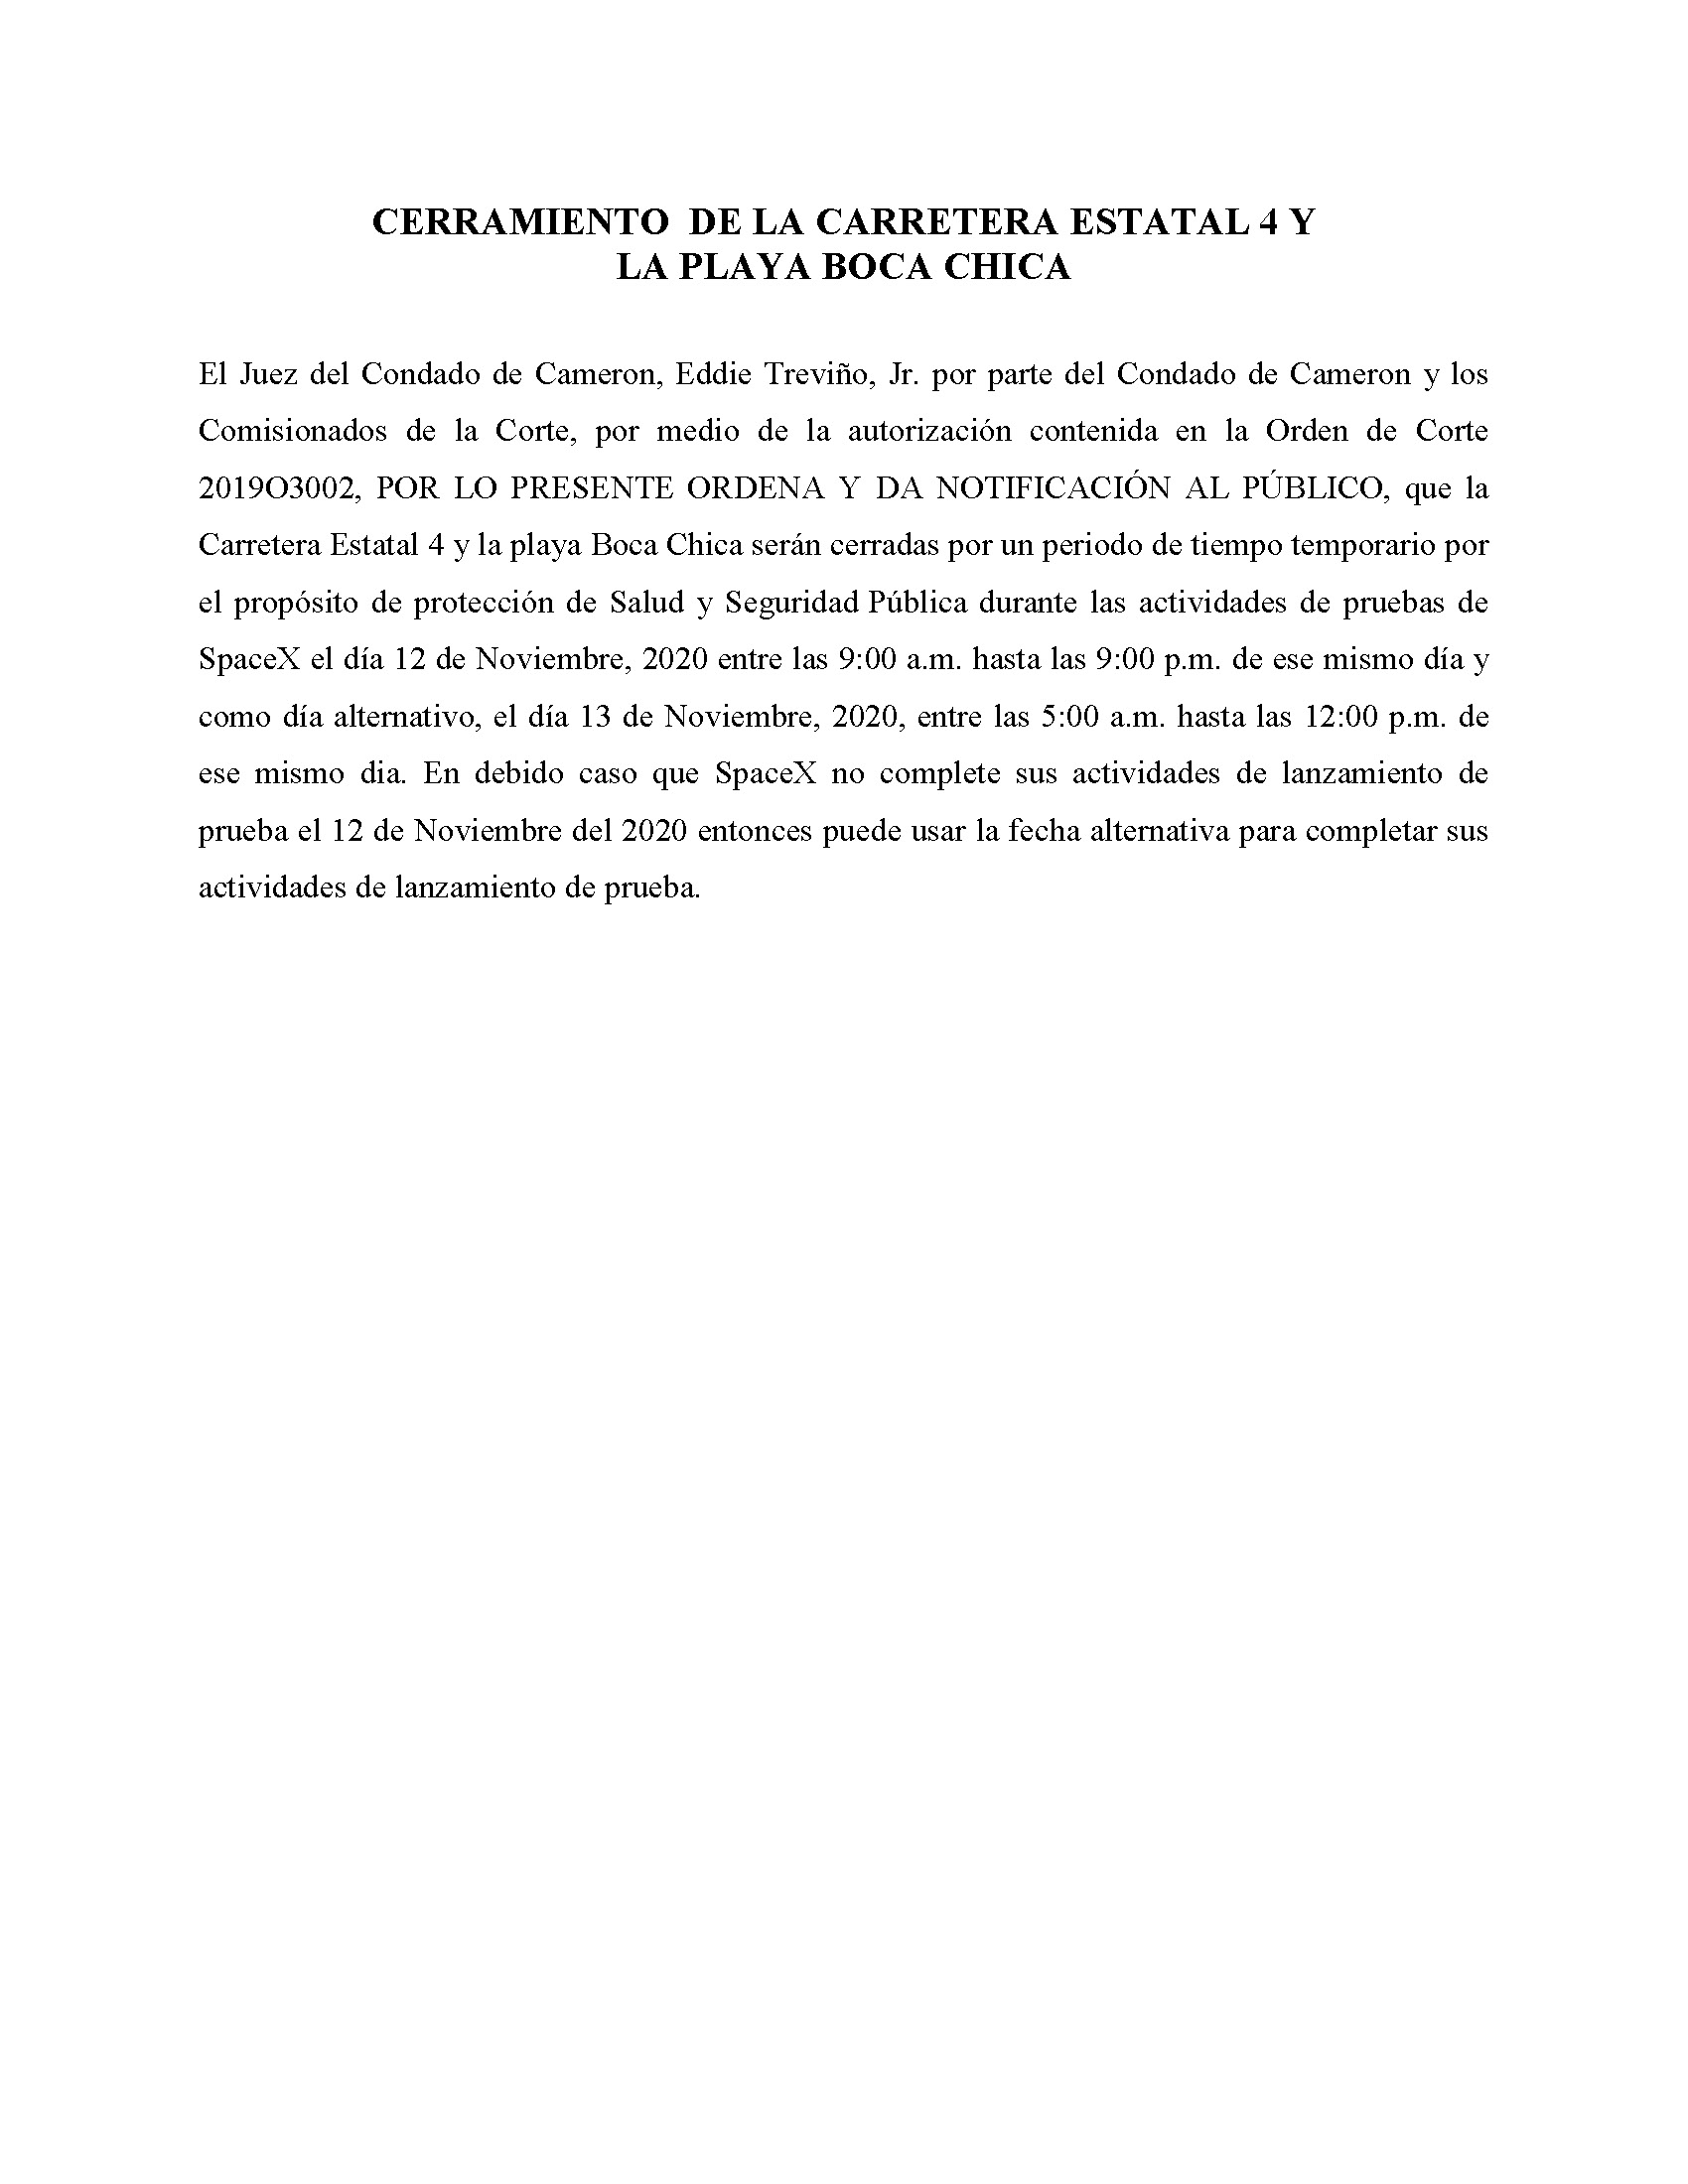 ORDER.CLOSURE OF HIGHWAY 4 Y LA PLAYA BOCA CHICA.SPANISH.11.12.20